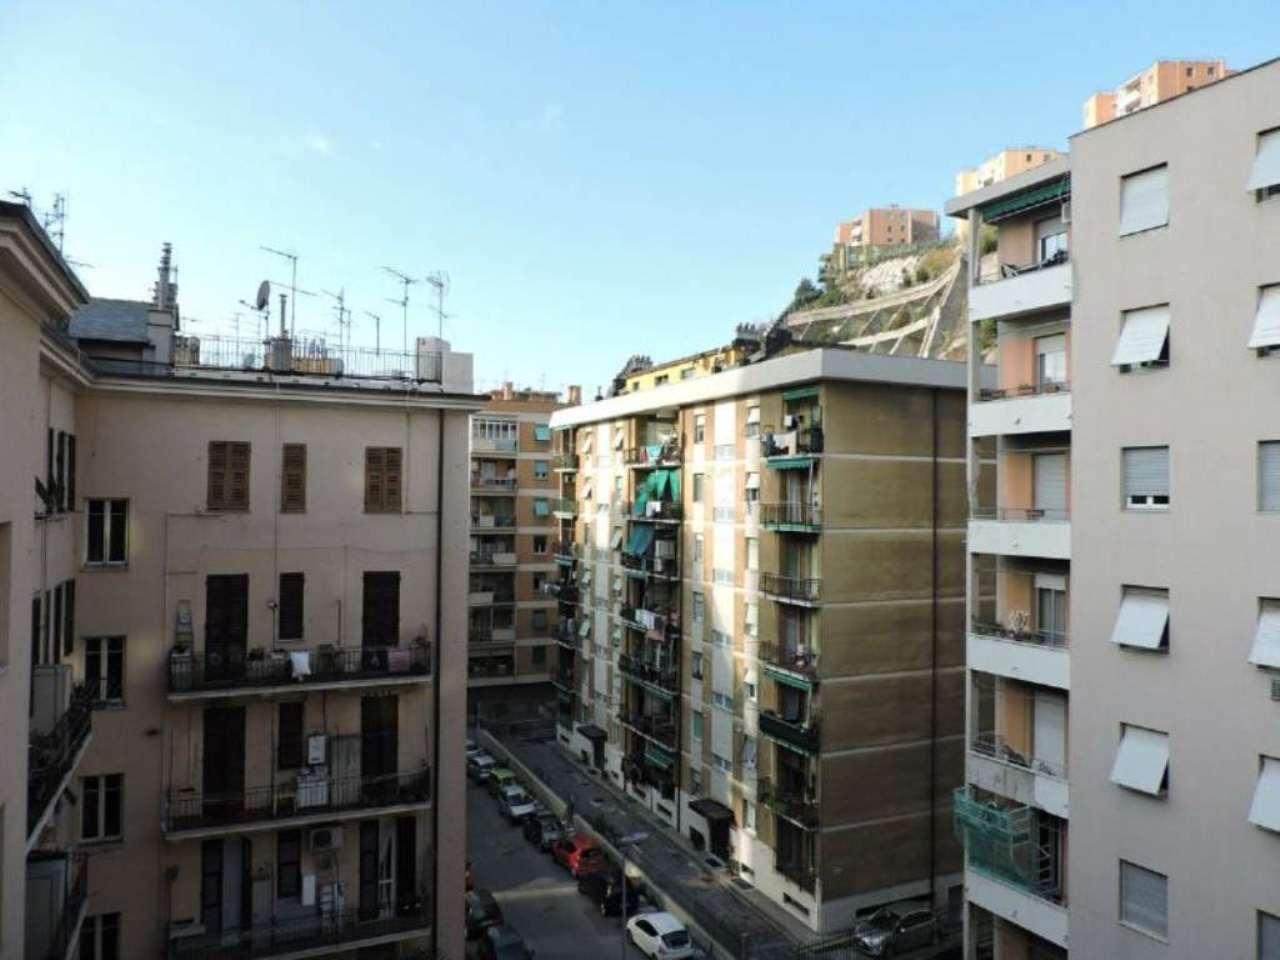 Bilocale Genova Via Dino Col 10